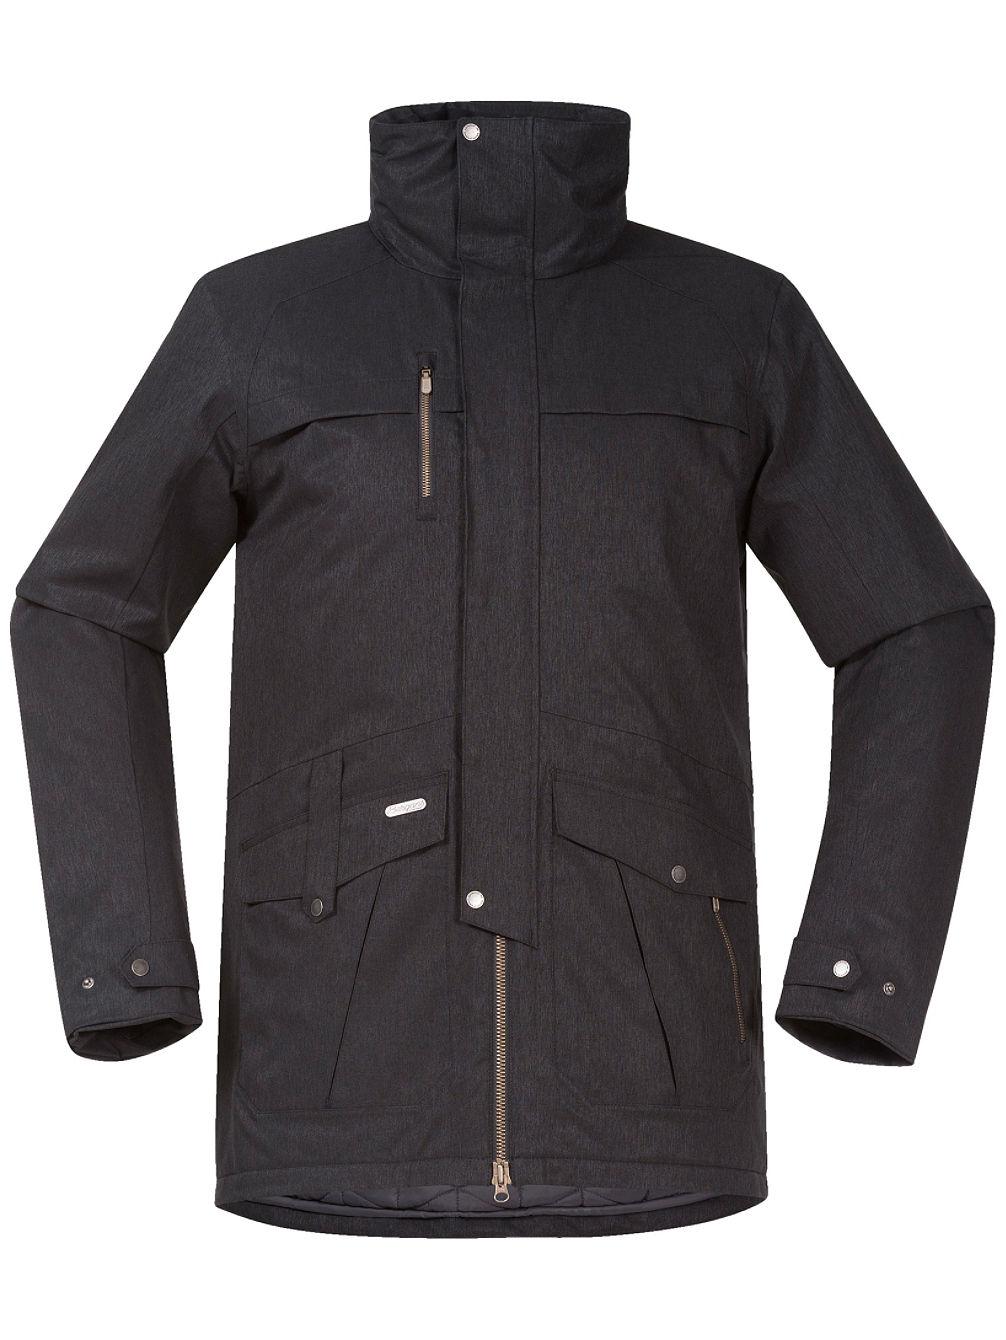 bergans-oslo-ins-outdoor-jacket